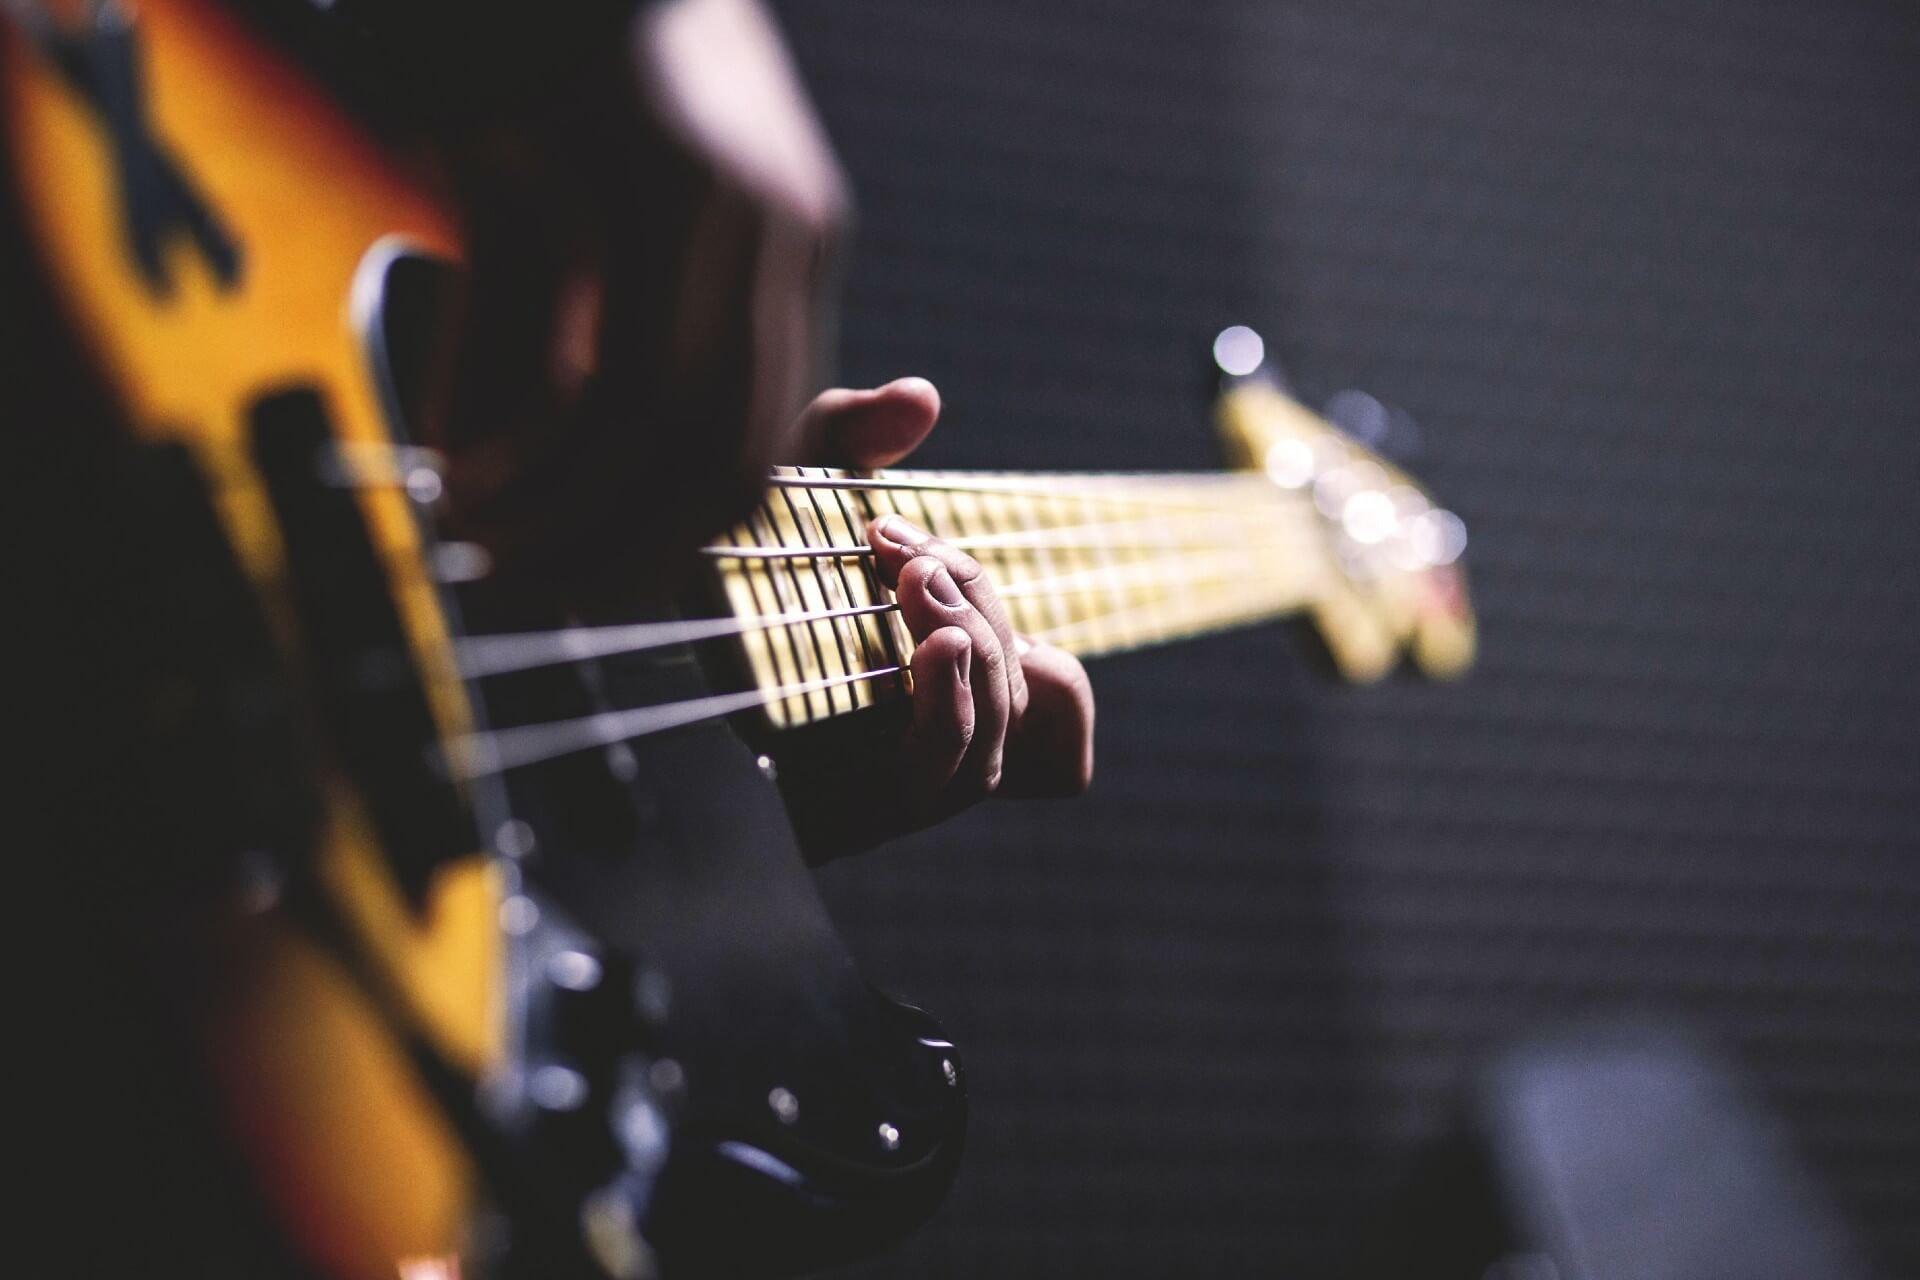 Guitar player using guitar studios. Book your creative guitar studio easily online today.